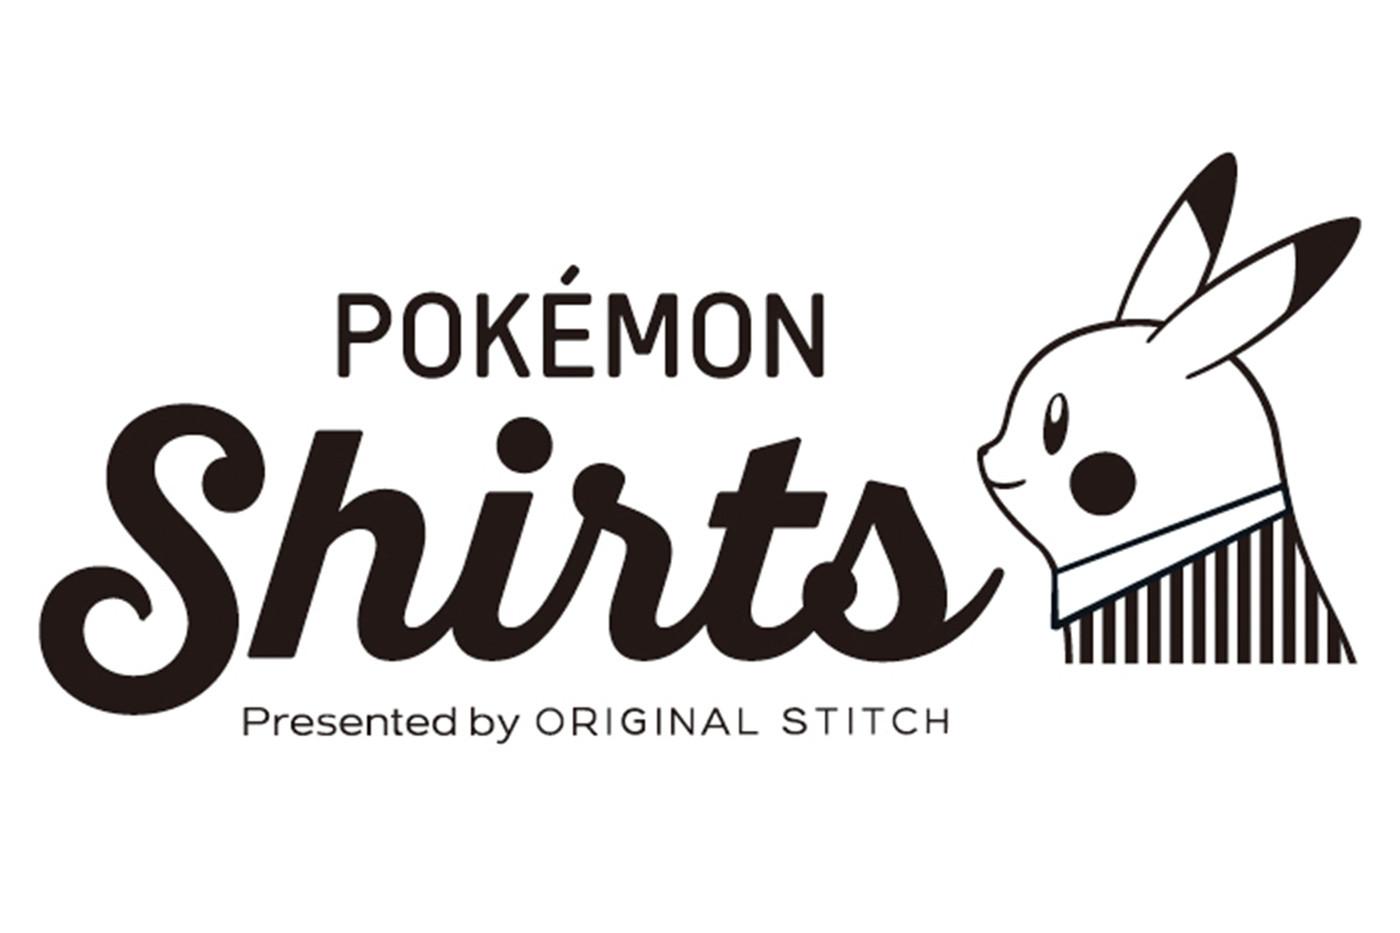 https___jp.hypebeast.com_files_2019_02_pokemon-shirts-pop-up-2019-feb-1-1.jpg